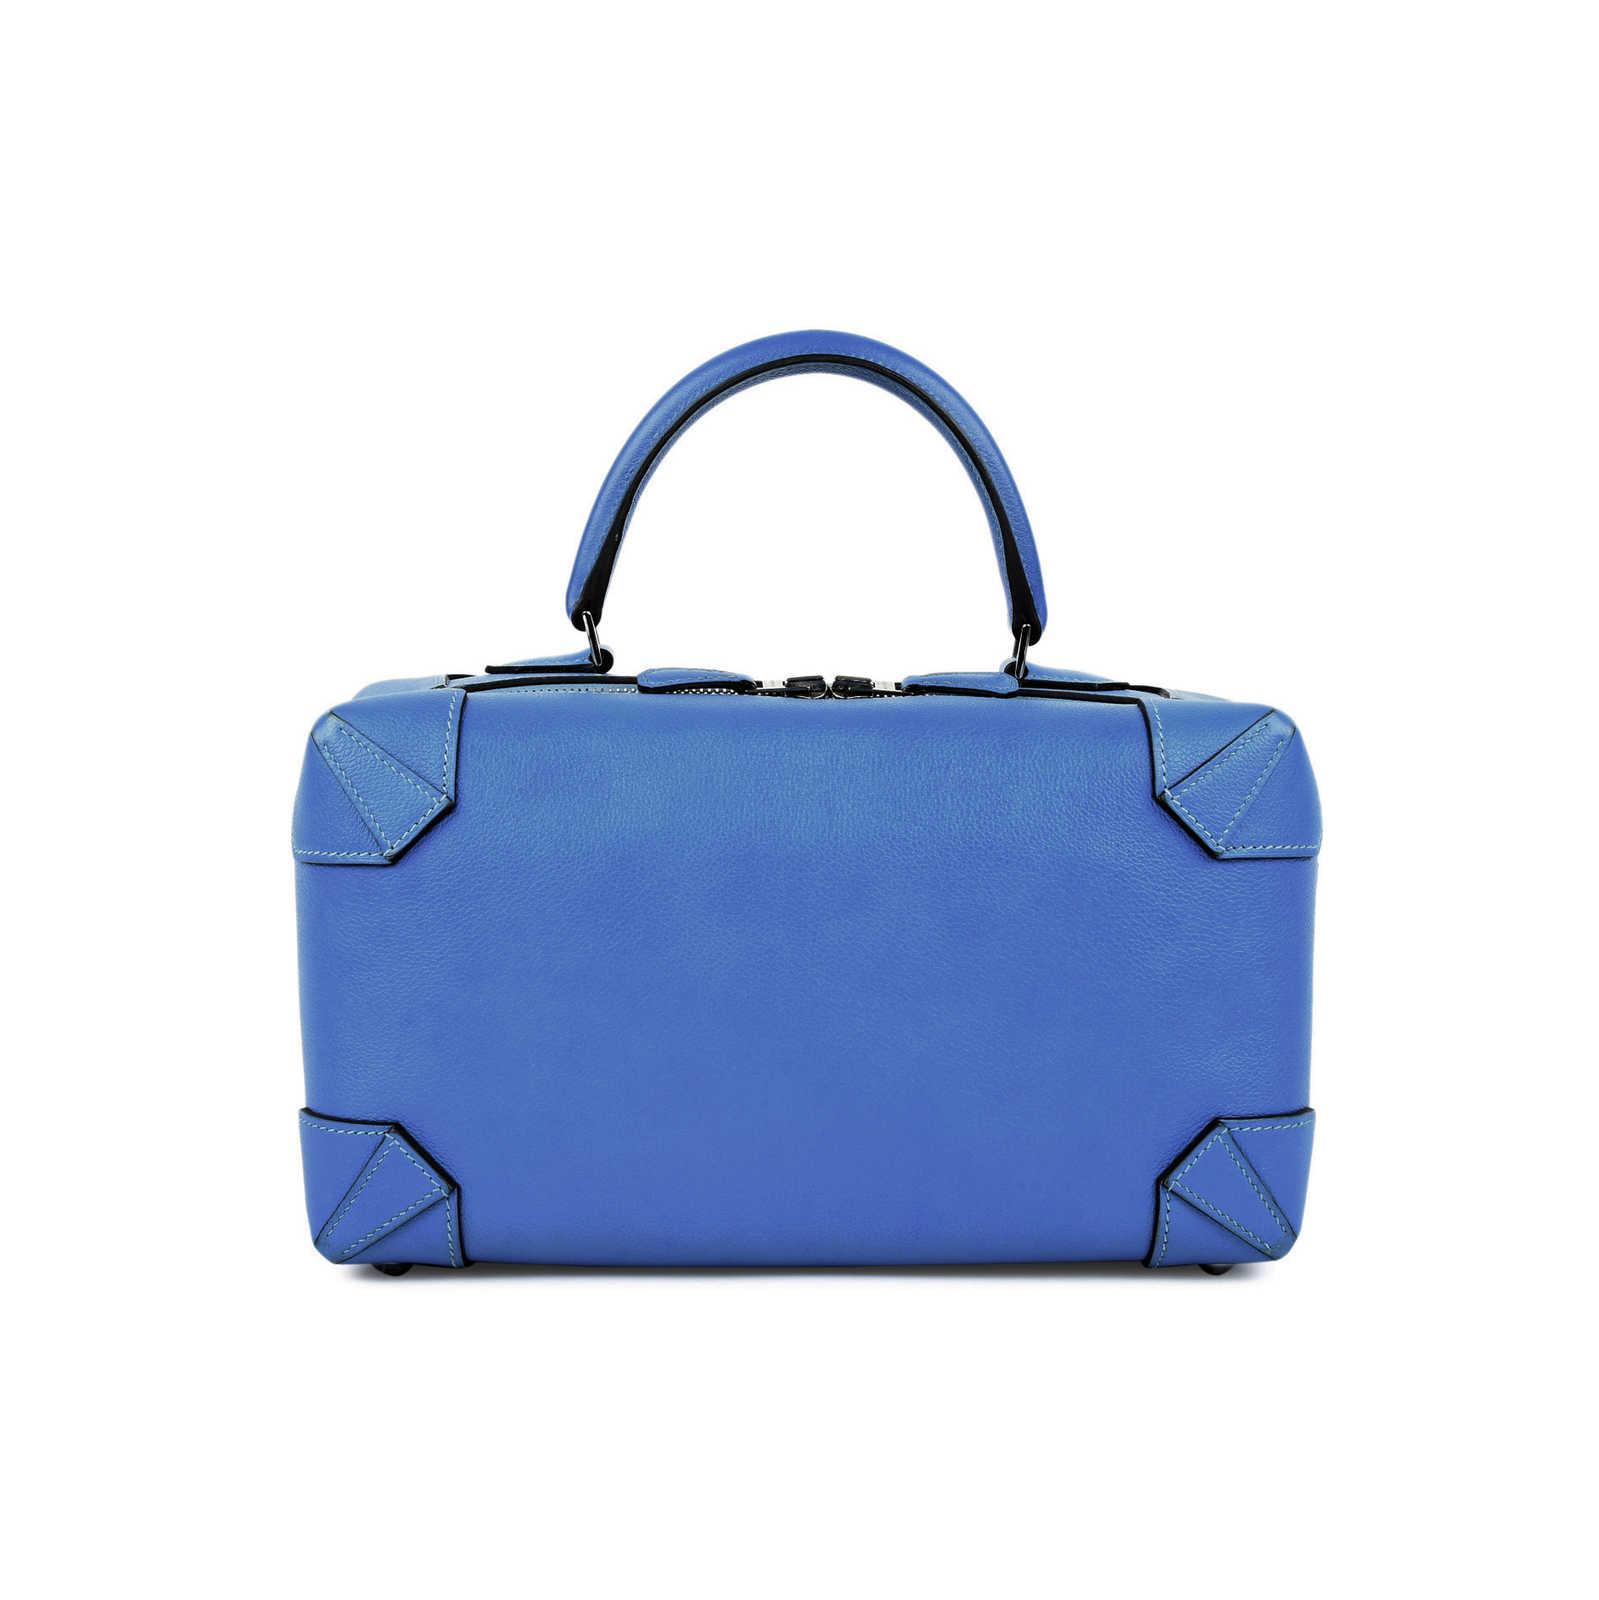 679f886901 Authentic Second Hand Hermès Bleu Paradis Maxibox 29 (PSS-473-00063) ...